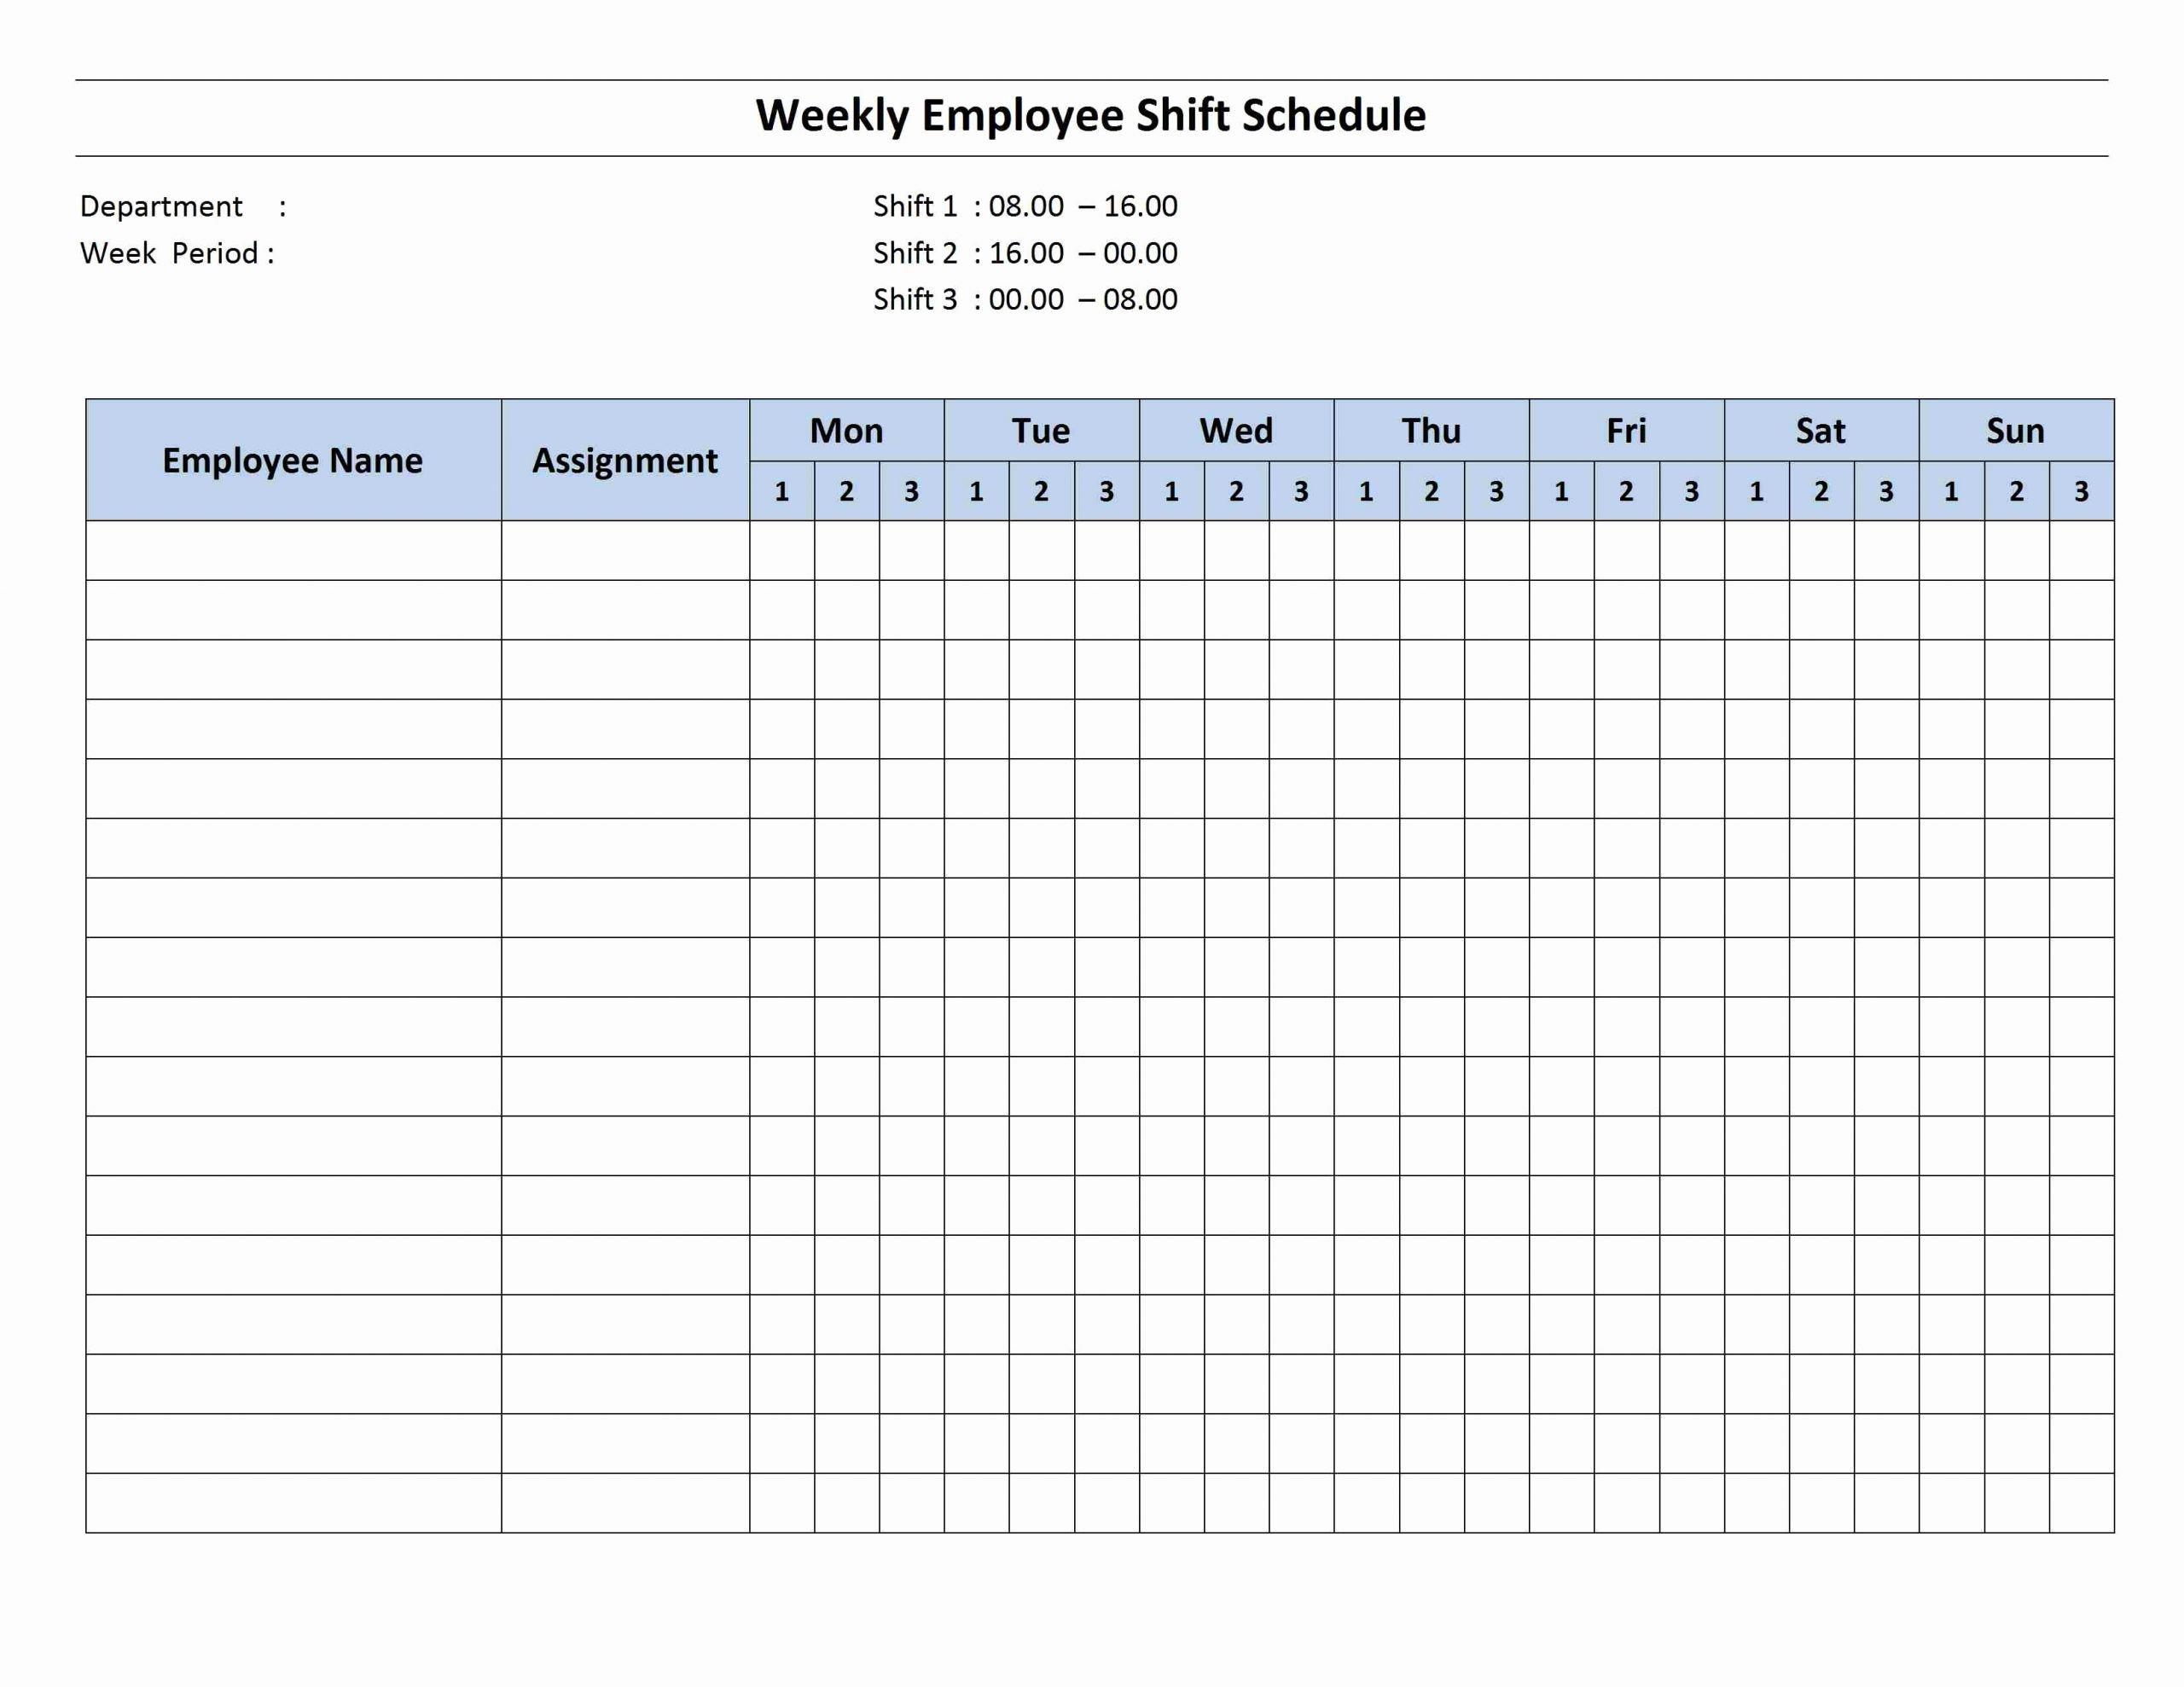 Week Work Schedule Template Beautiful Weekly 8 Hour Shift Schedule